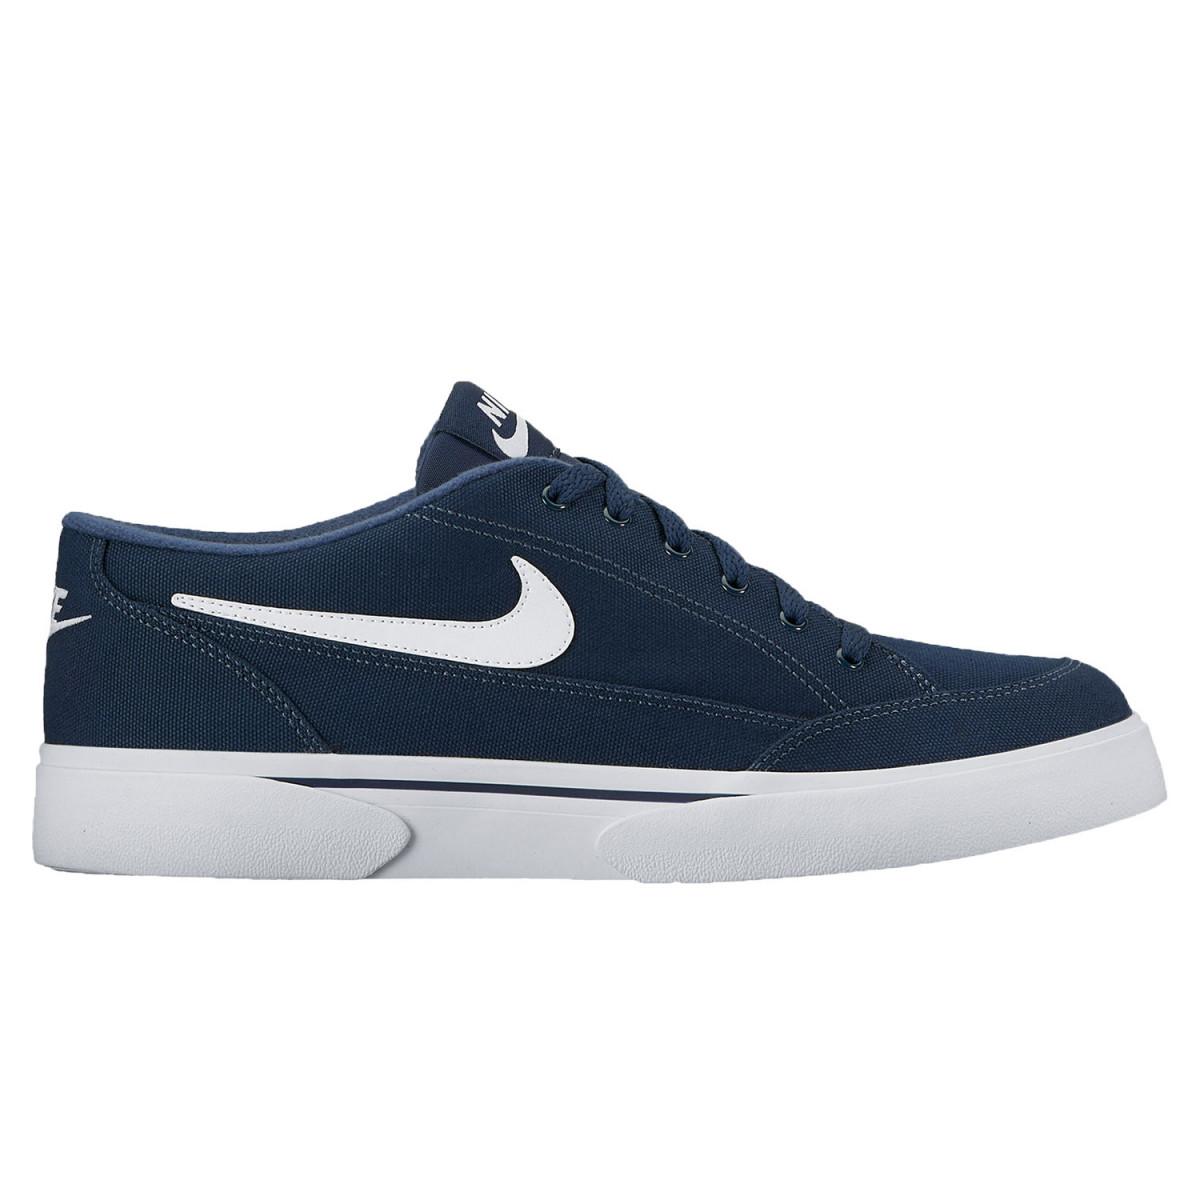 Zapatillas Nike Gts 16 Txt